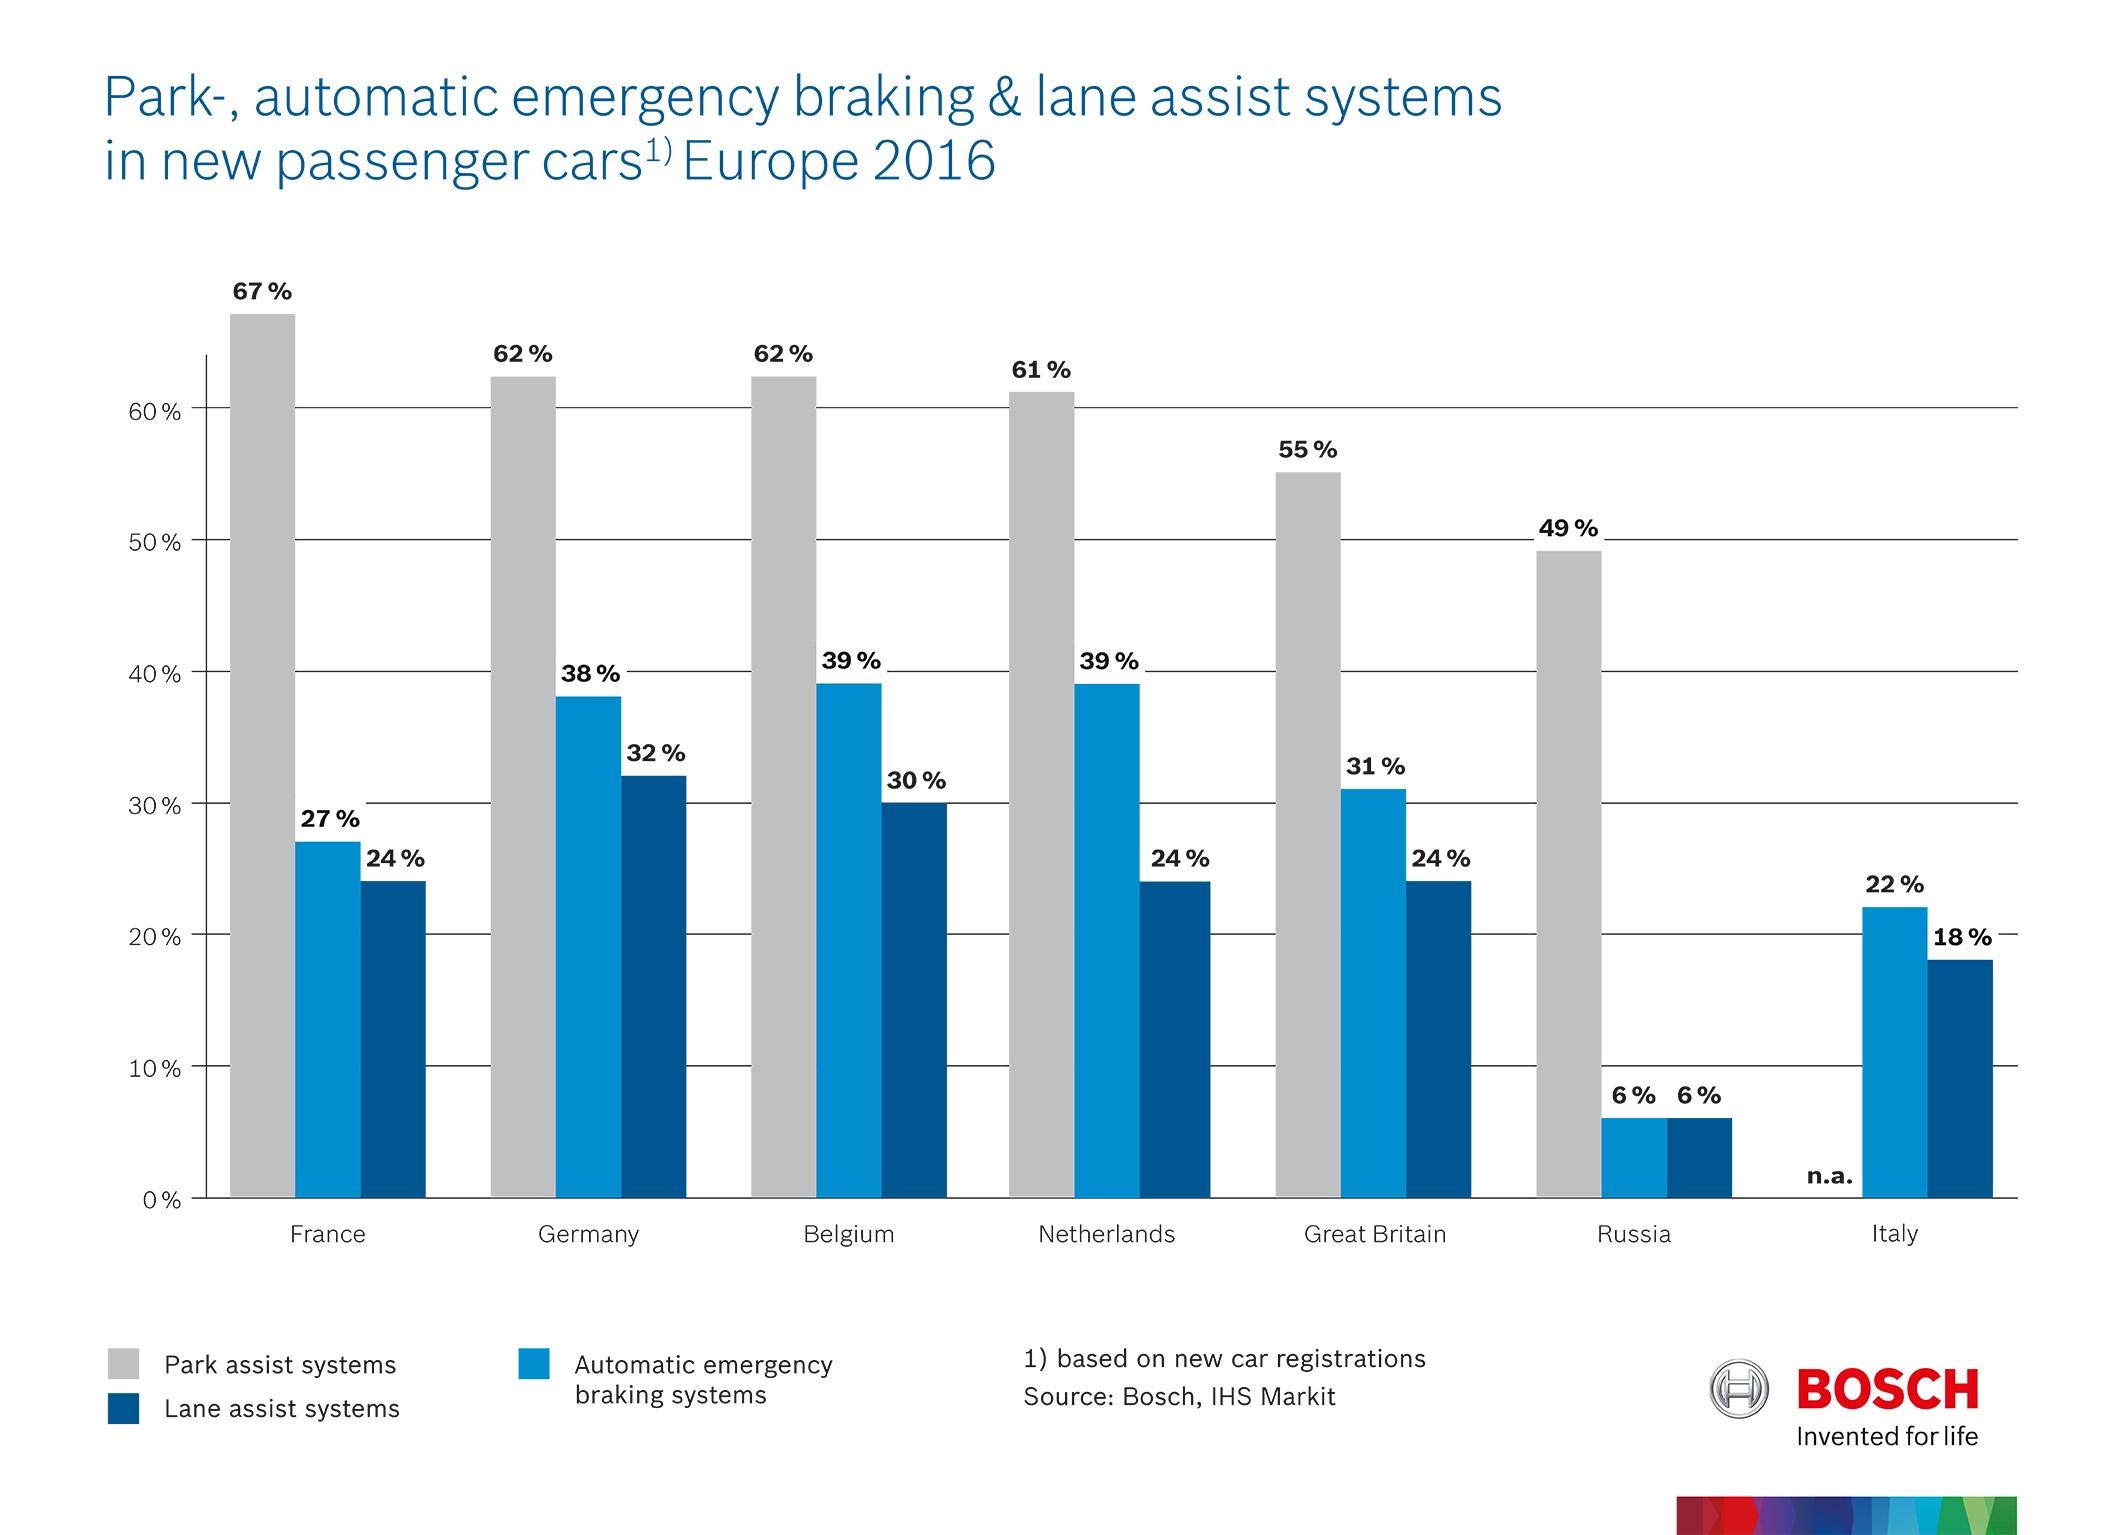 Bosch-analyse: rijhulpsystemen zetten sterke opmars verder